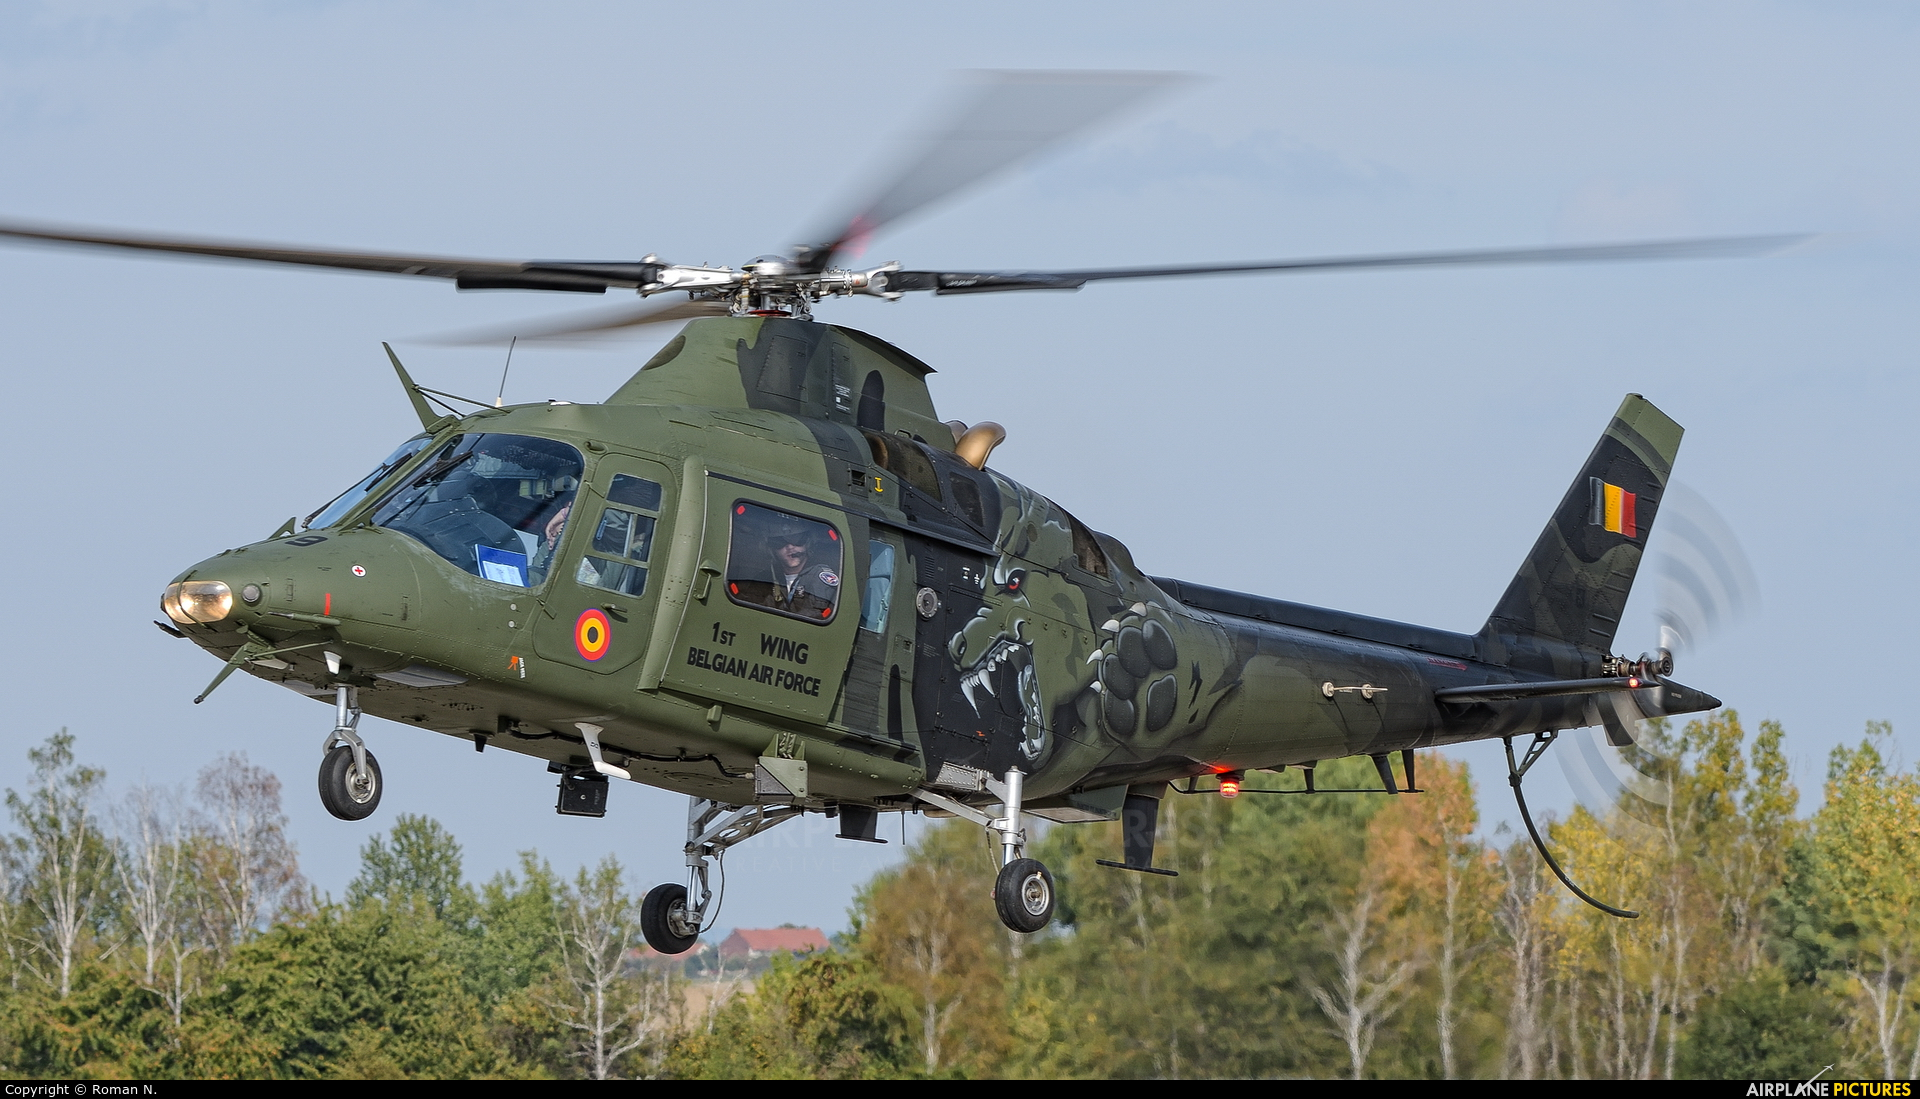 Belgium - Air Force H-29 aircraft at Hradec Králové